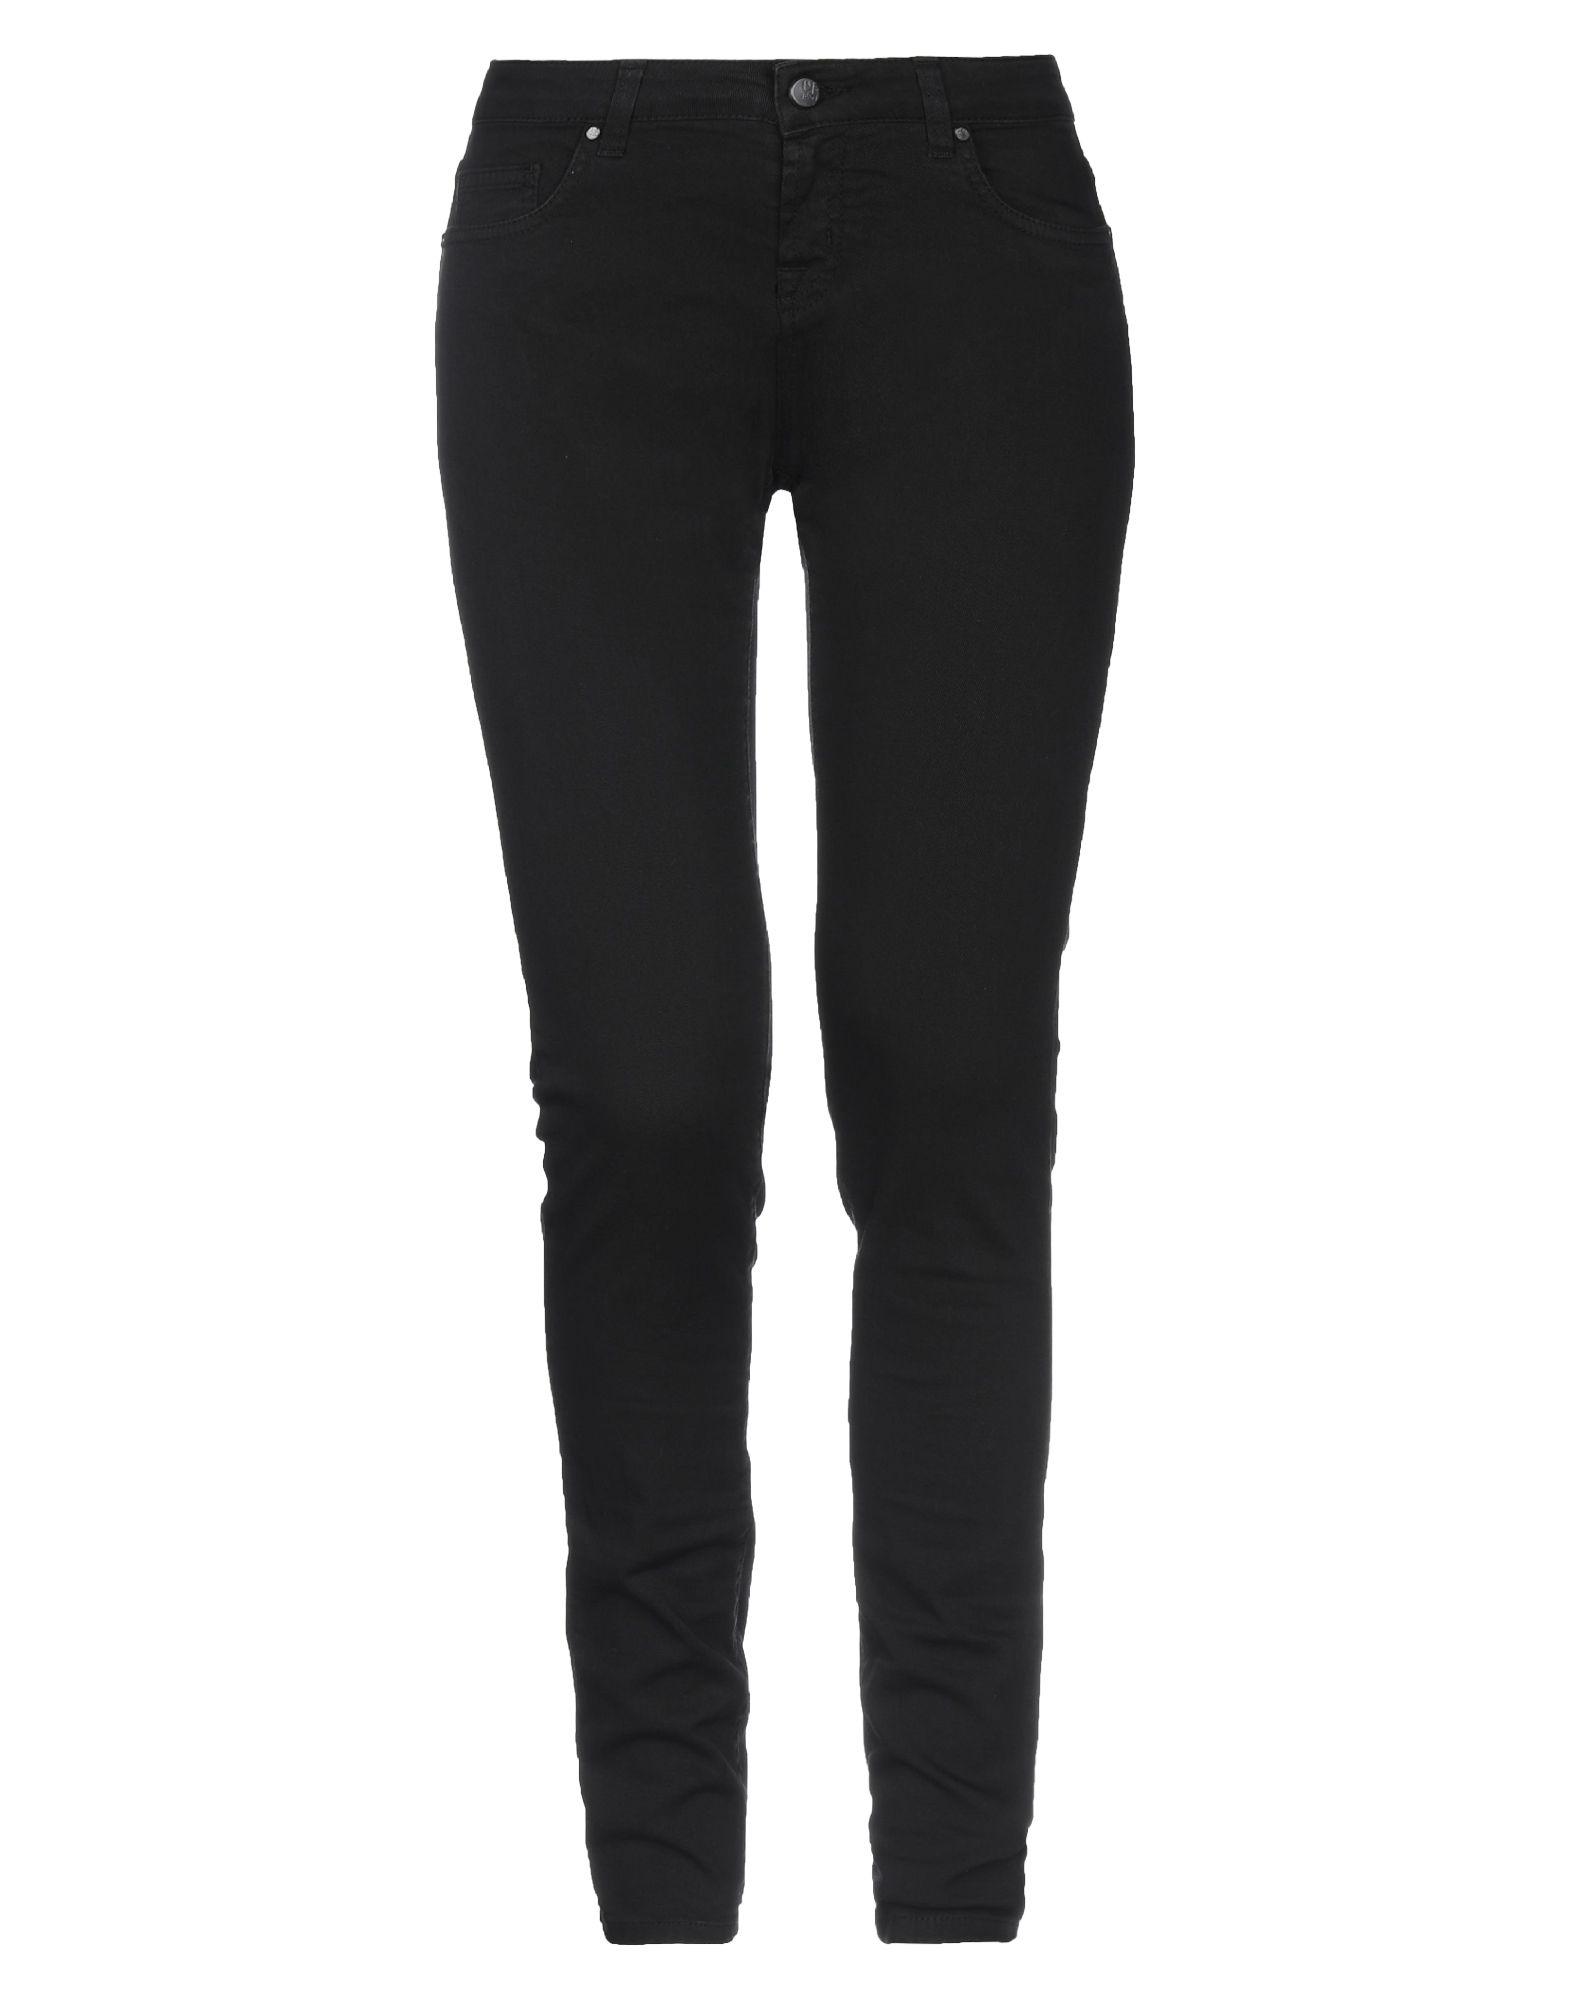 UP ★ JEANS Повседневные брюки skinny lace up jeans